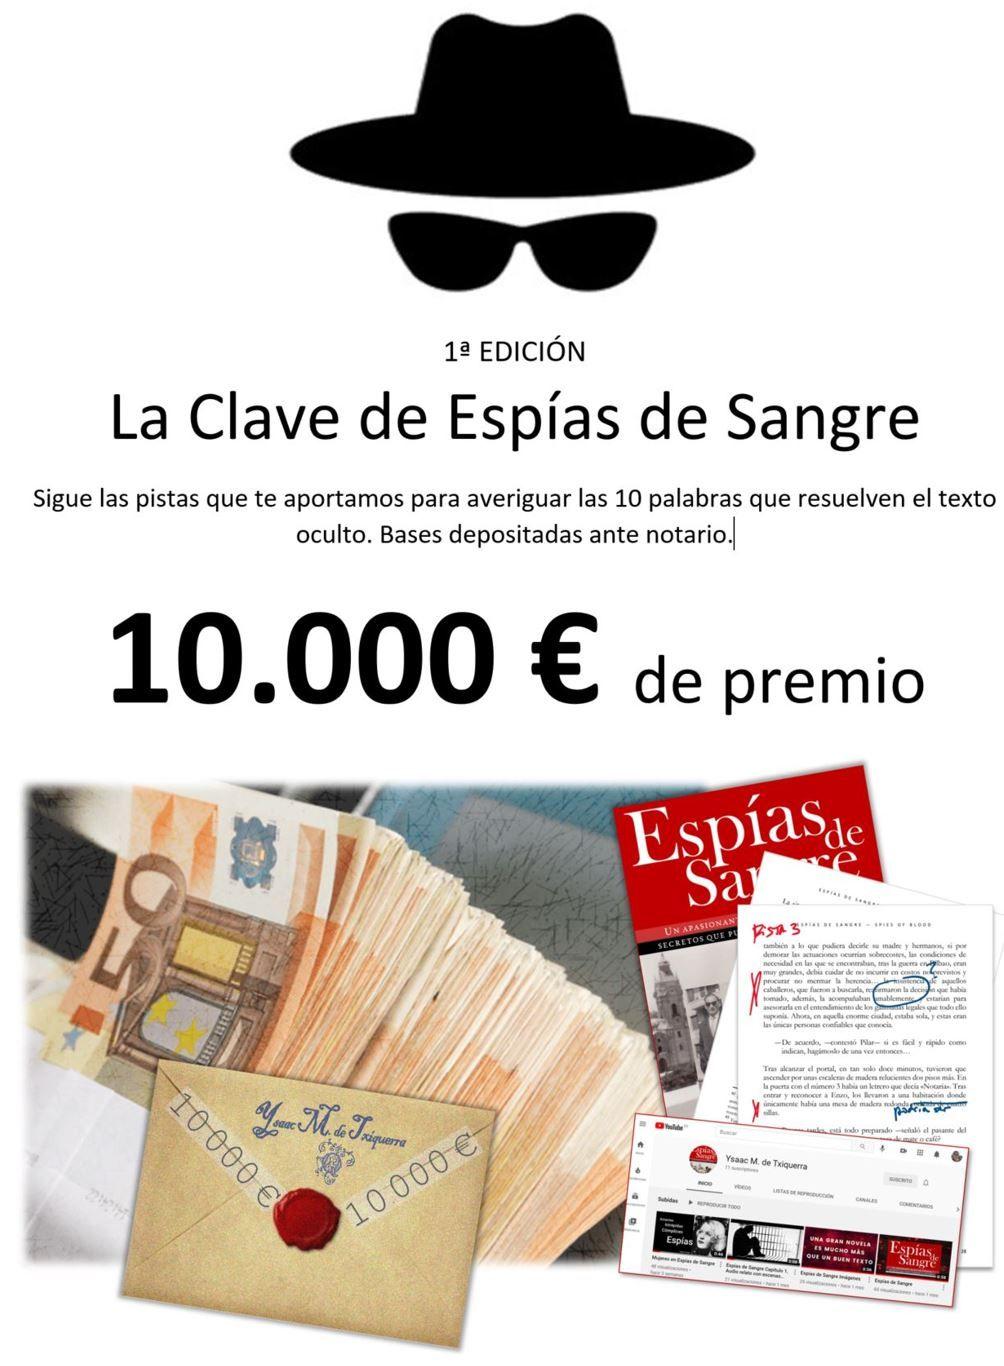 'Espías de Sangre', la novela innovadora que premia a sus lectores con 10.000 euros